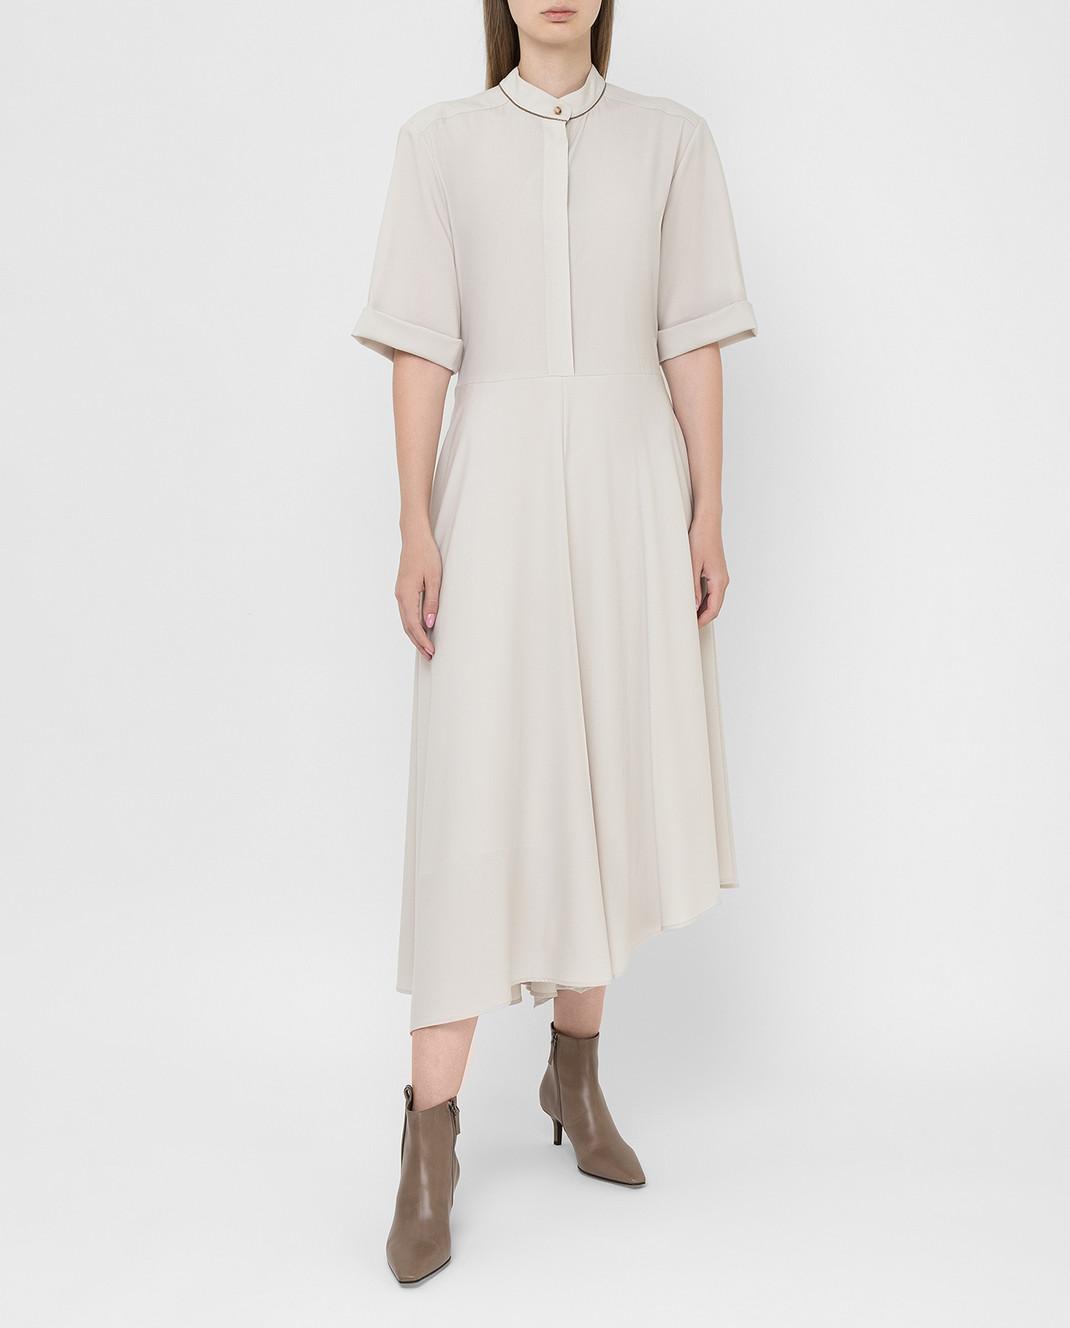 Brunello Cucinelli Светло-бежевое платье из шерсти изображение 2